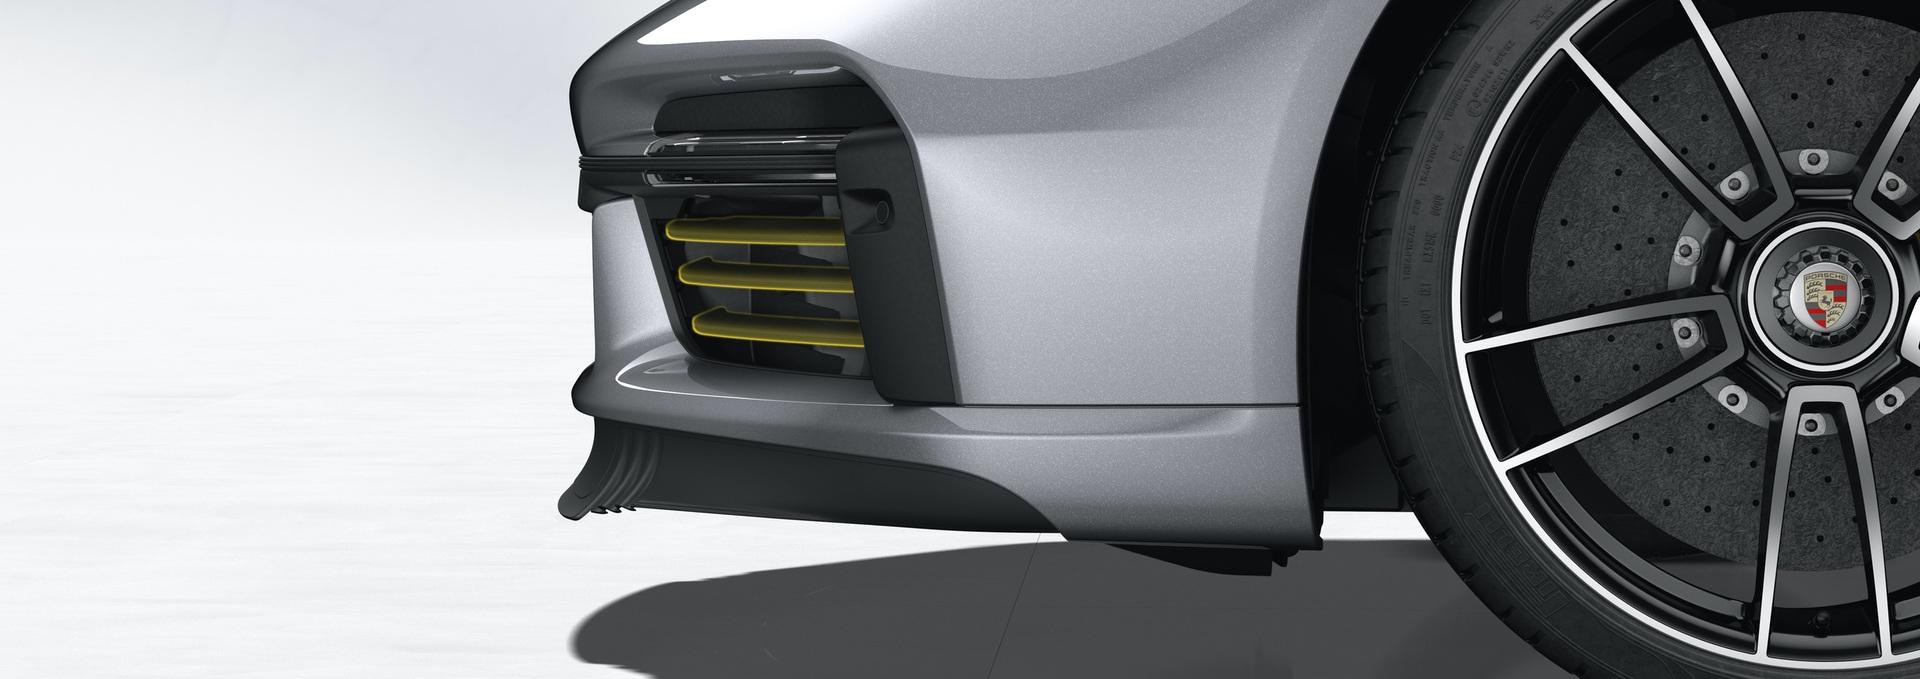 2020_Porsche_911-Turbo_S-aerodynamics_0005